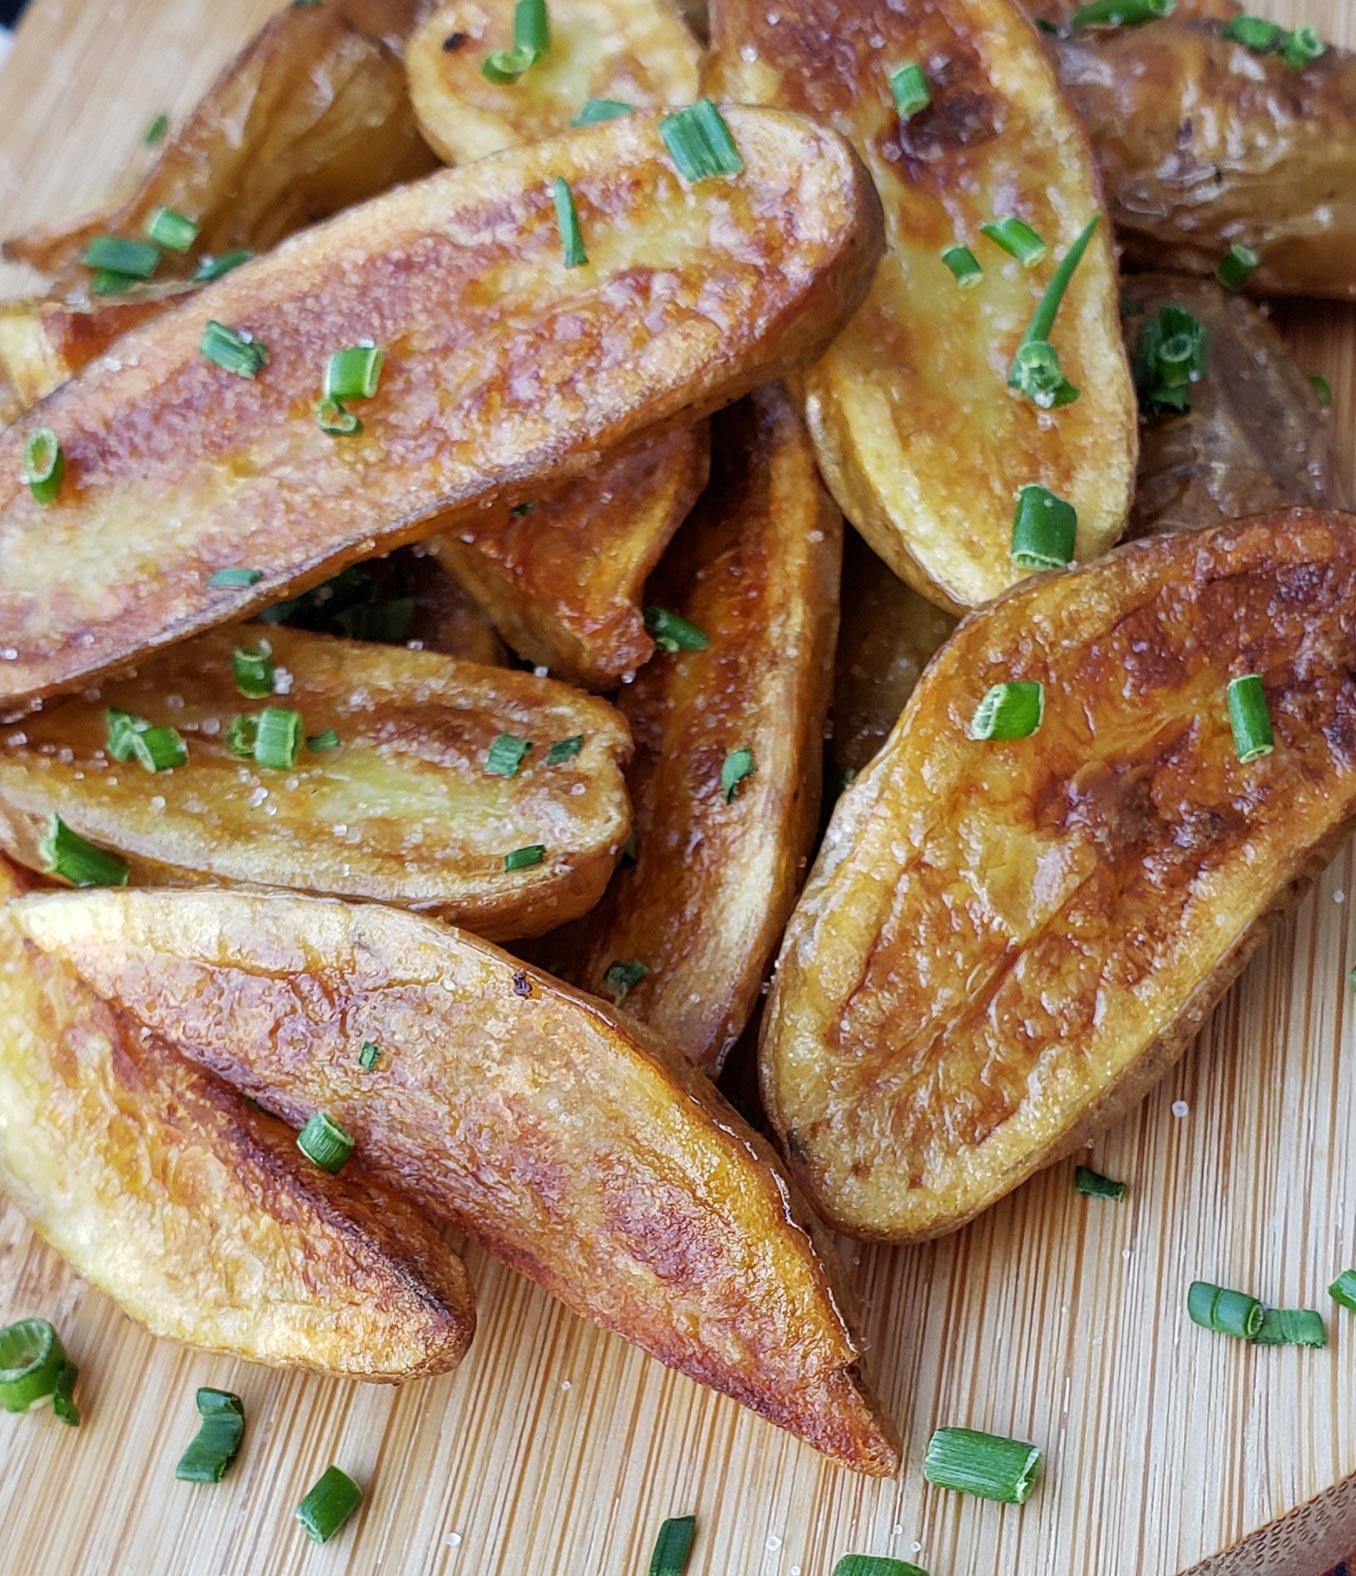 Plank Fries